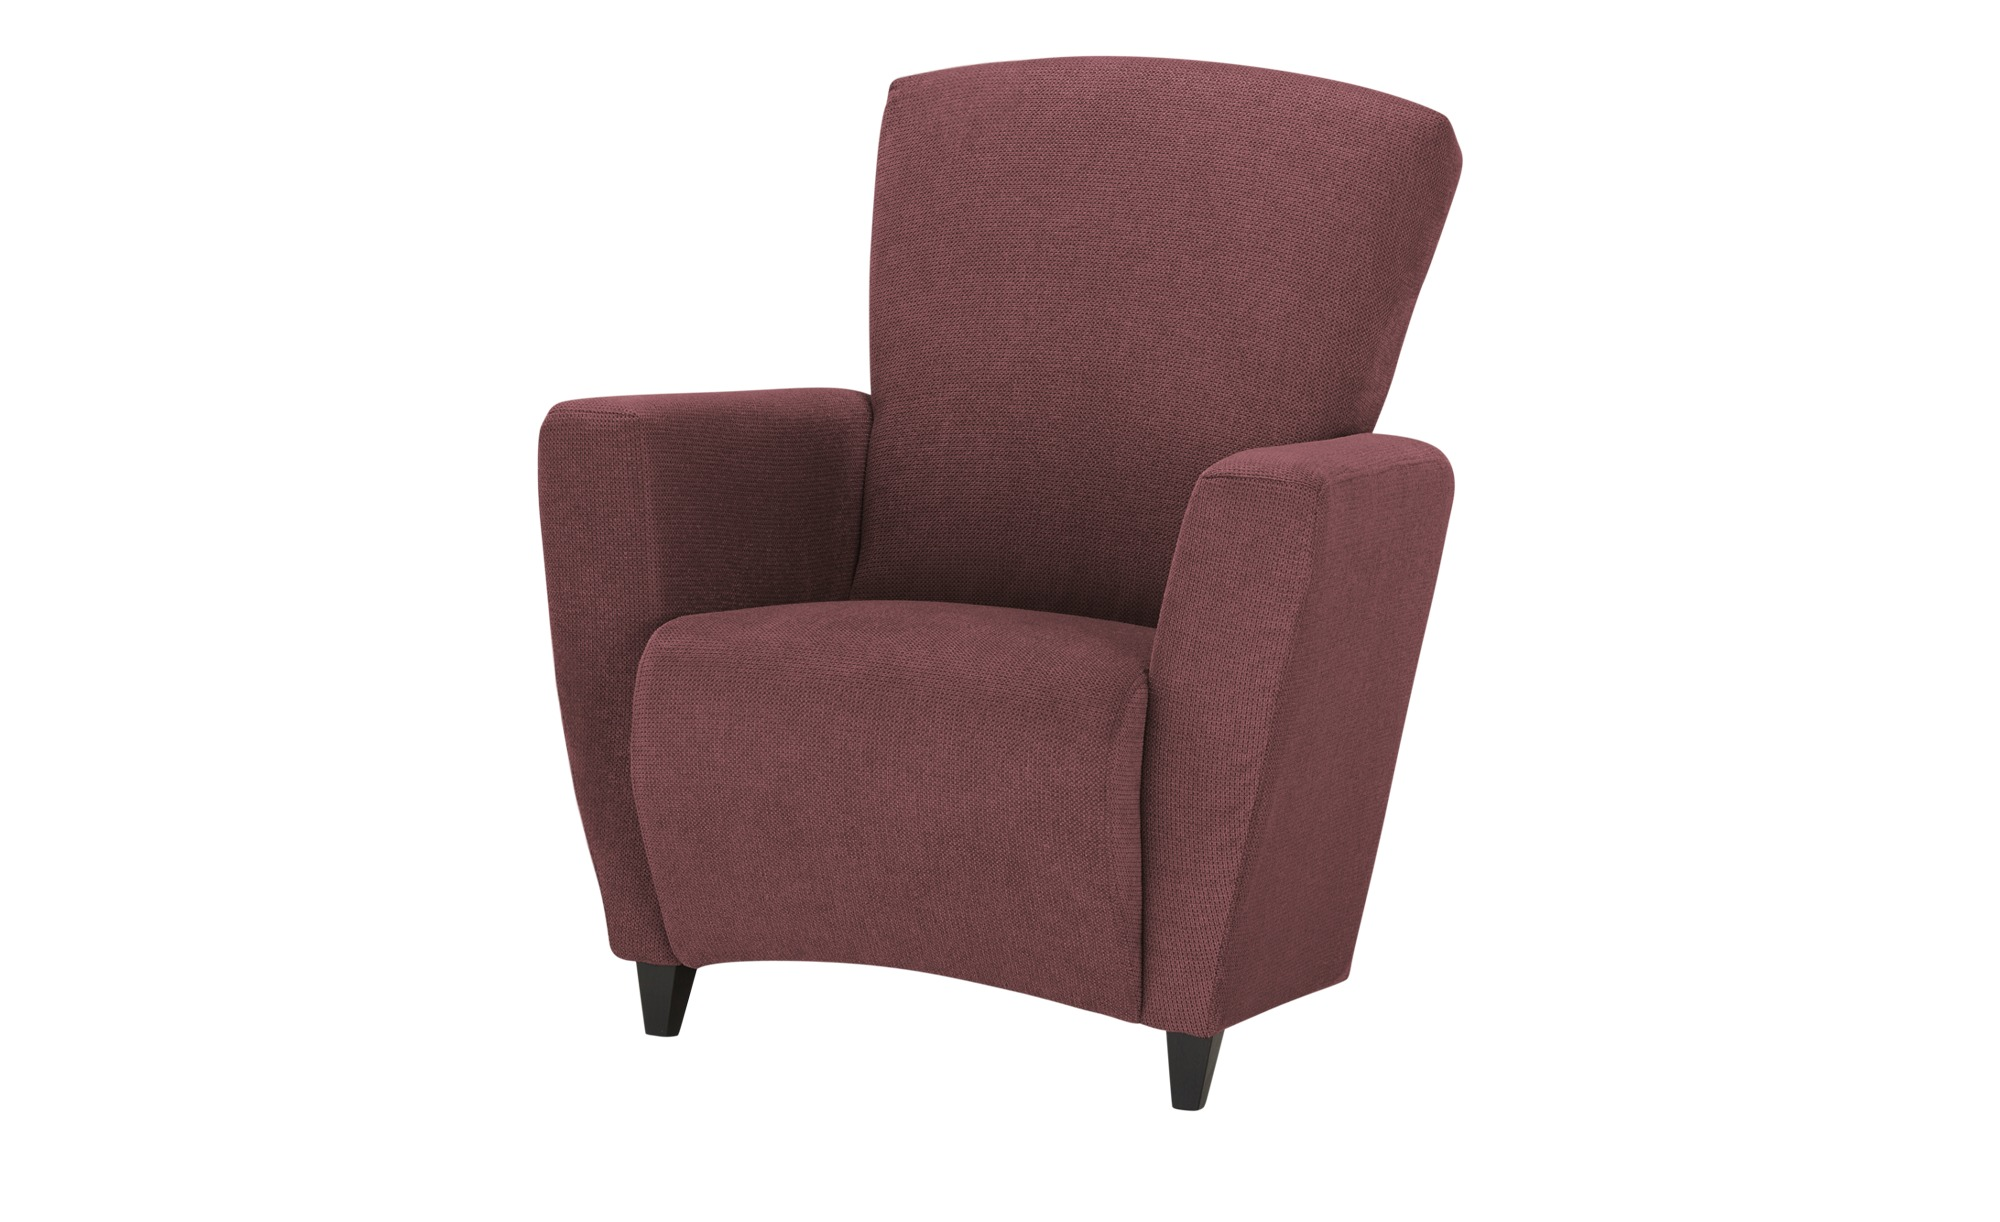 smart Sessel  Alma ¦ rot ¦ Maße (cm): B: 84 H: 94 T: 80 Polstermöbel > Sessel > Polstersessel - Höffner